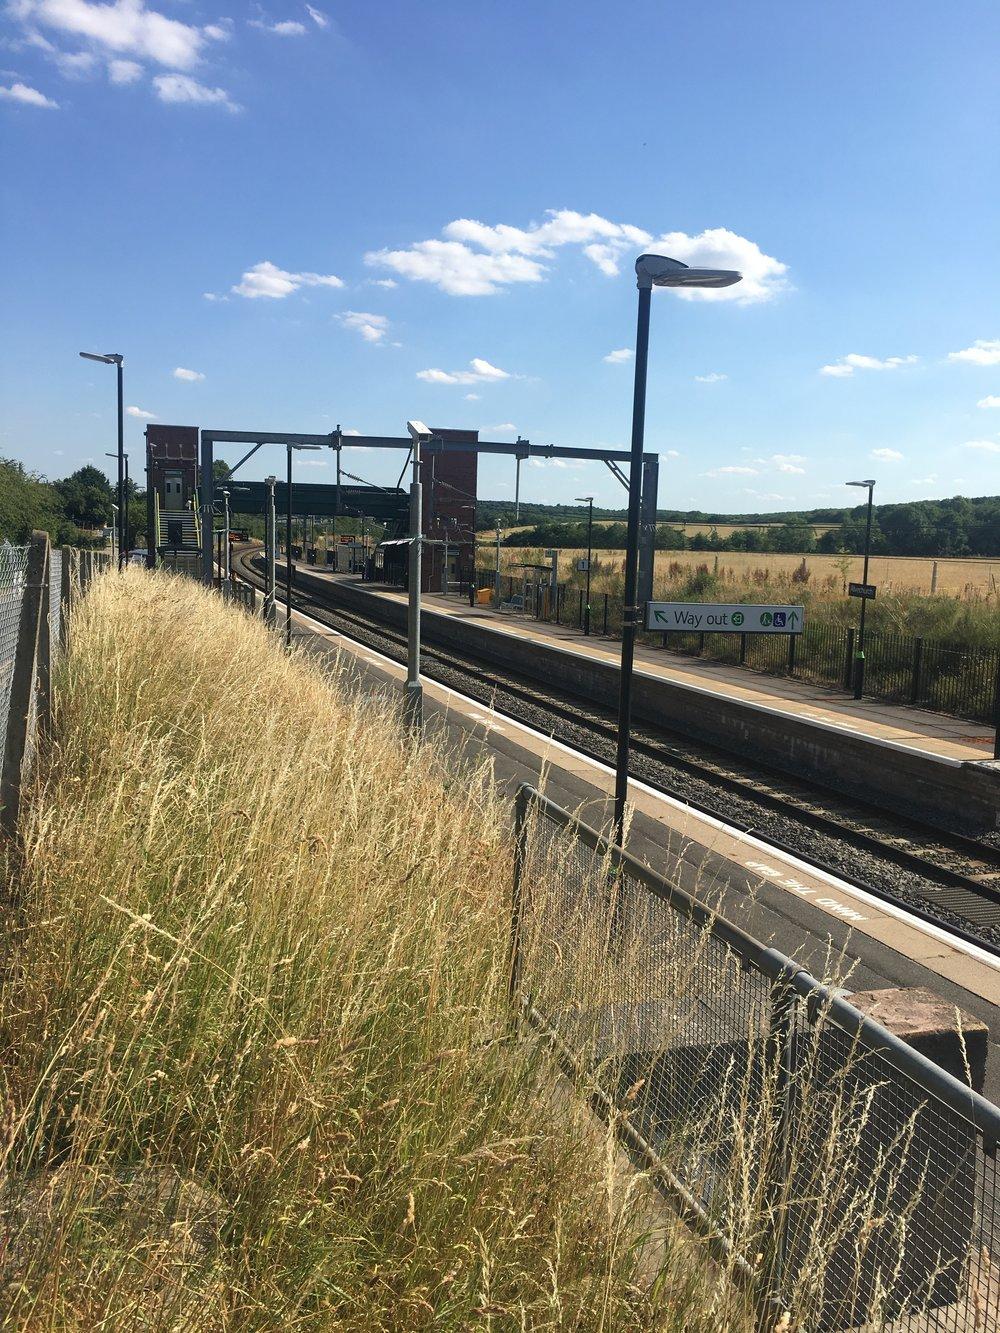 Arrive at Alvechurch Station -